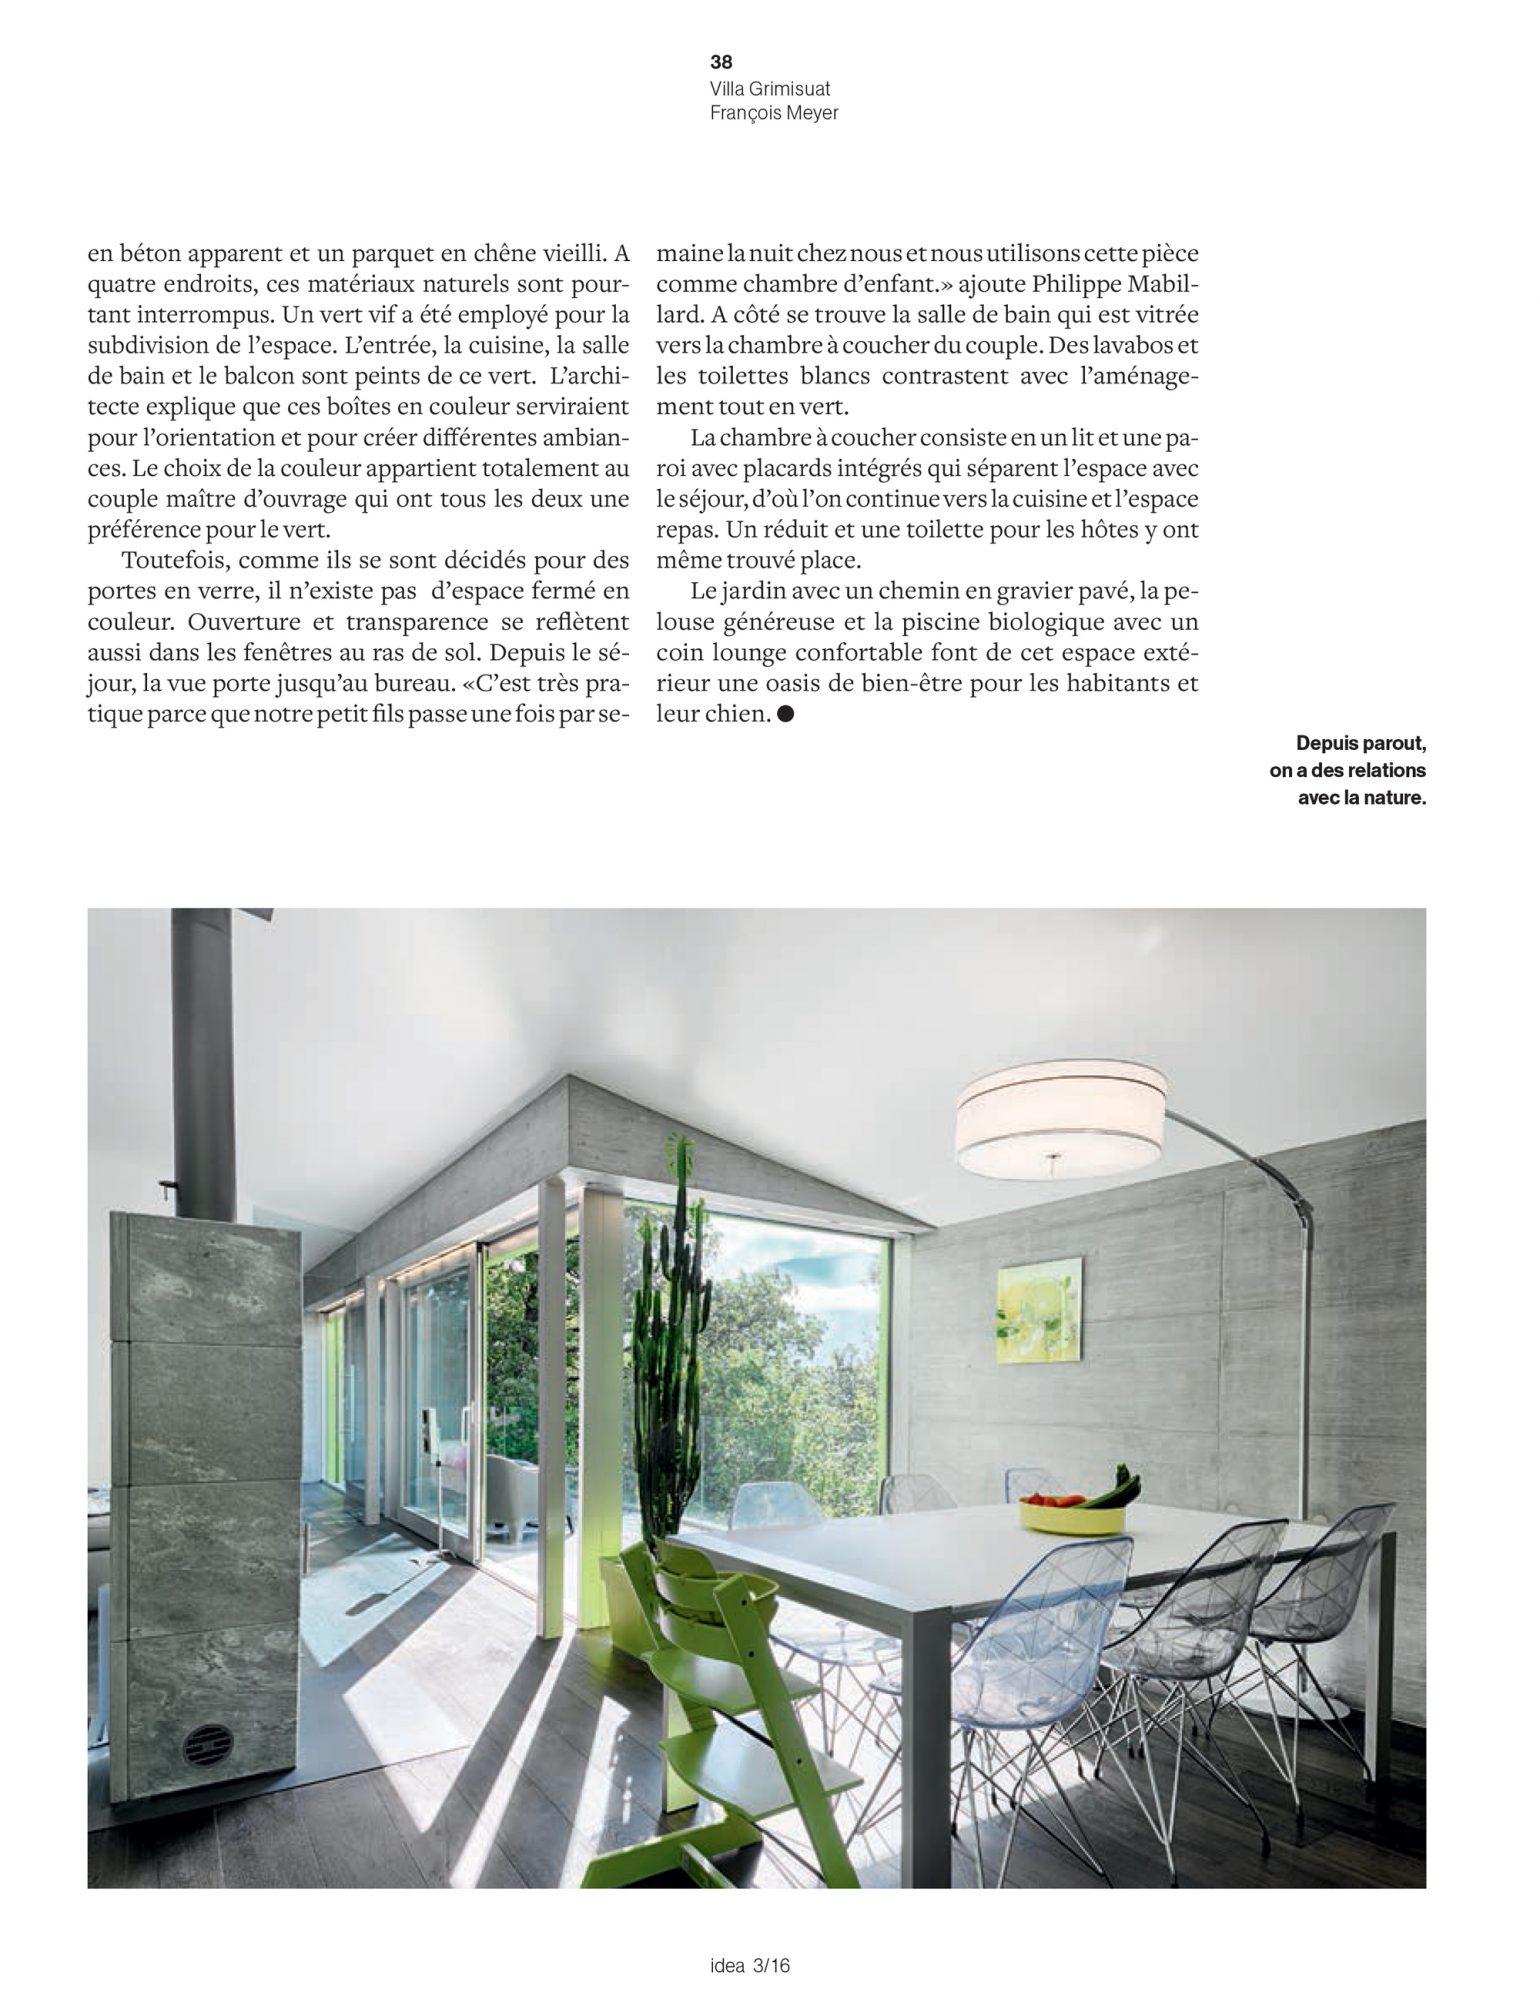 2016_idea_meyer_architecture_sion_03